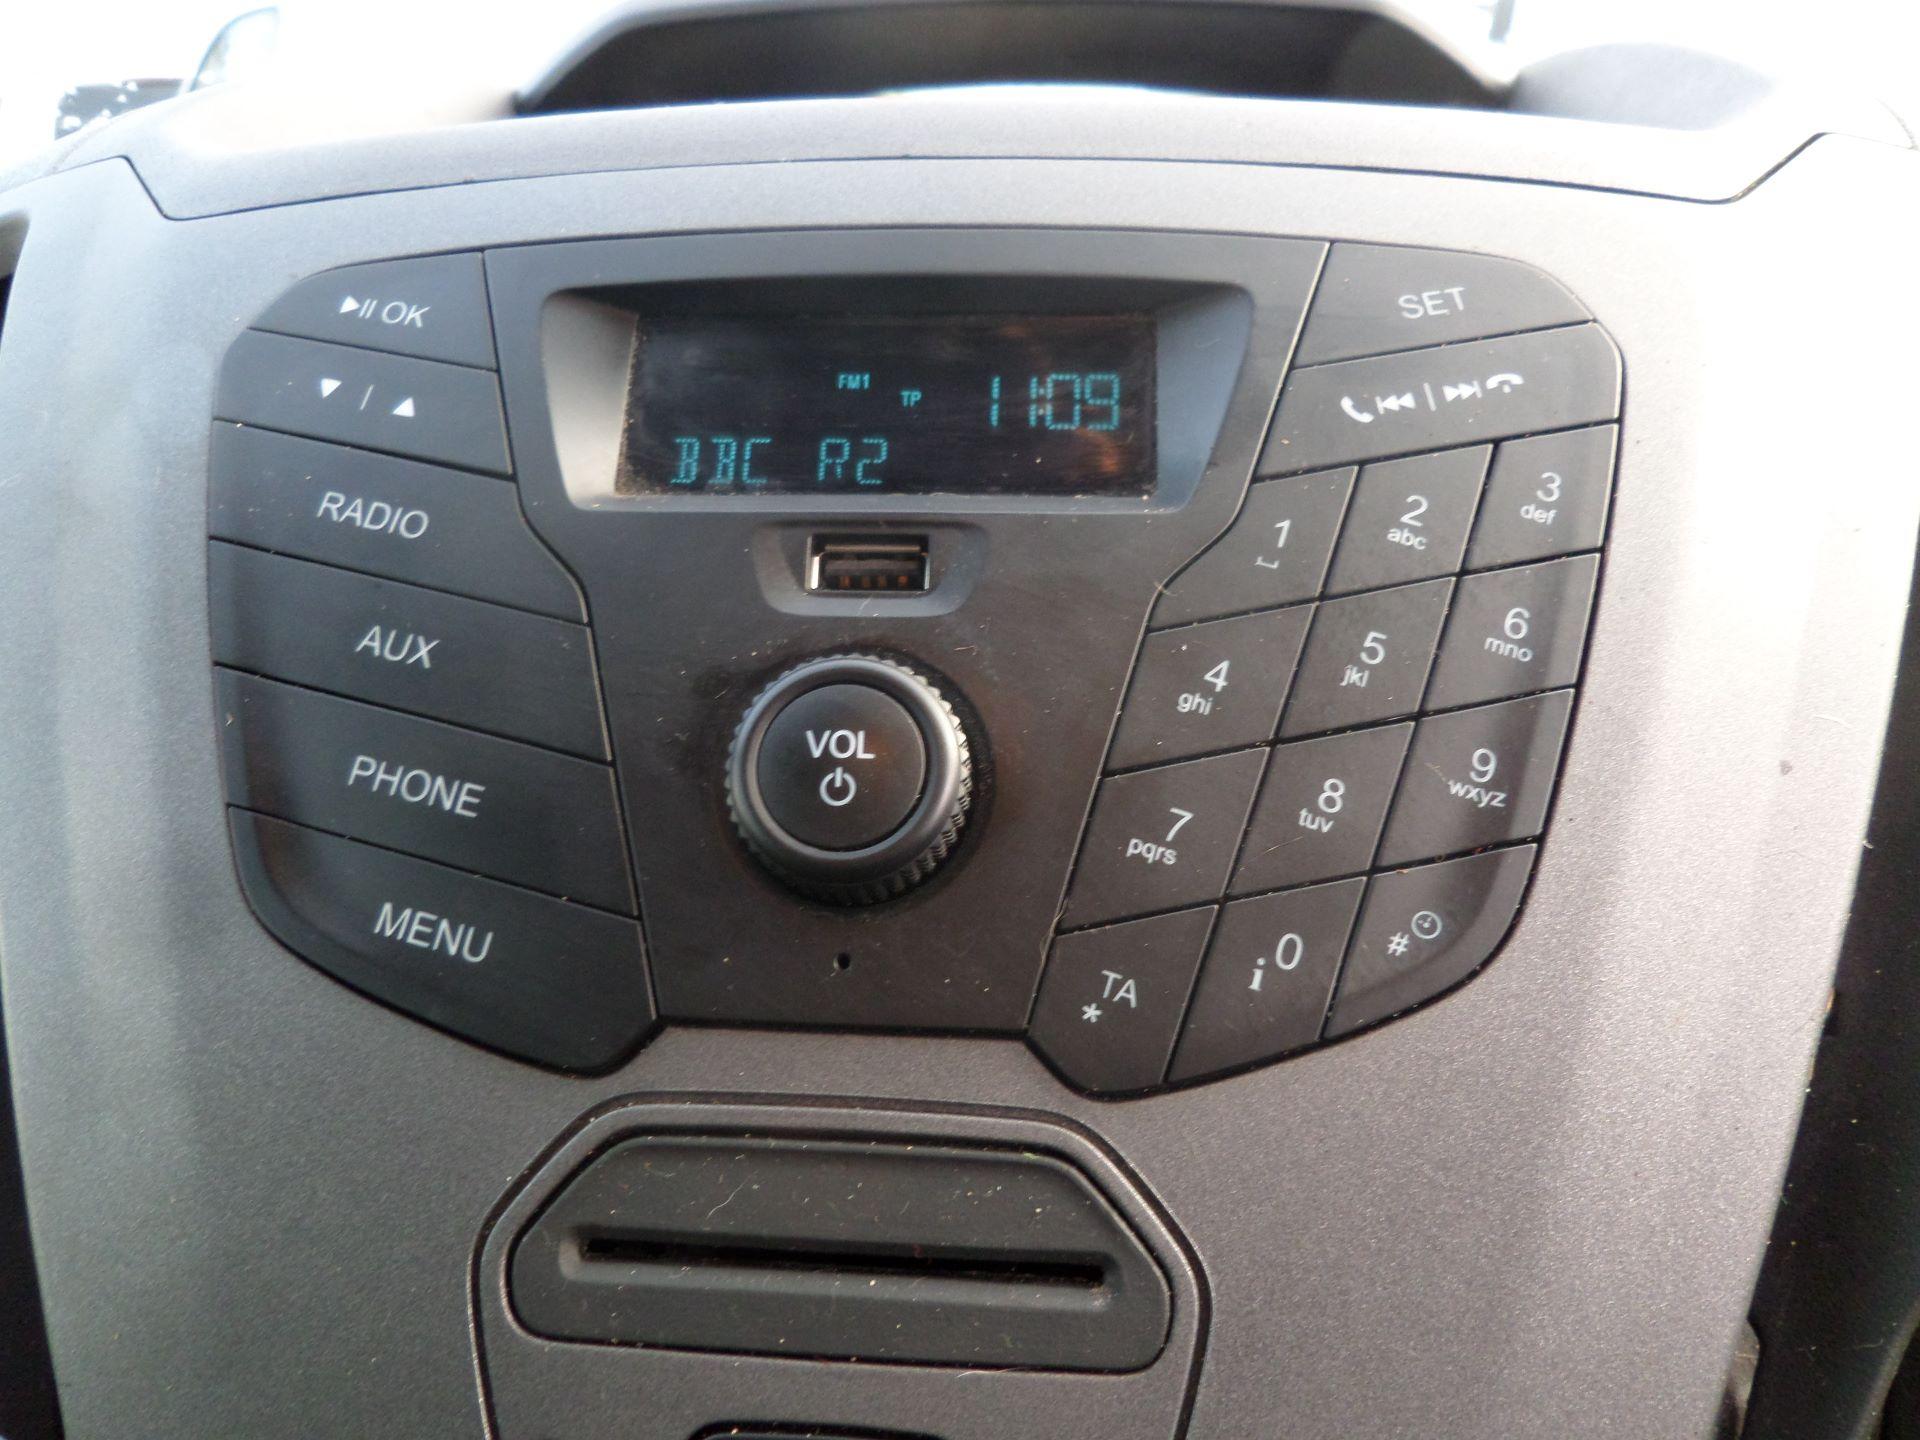 2018 Ford Transit 2.0 Tdci 130Ps Dropside Euro 6 (BK18JUT) Image 10